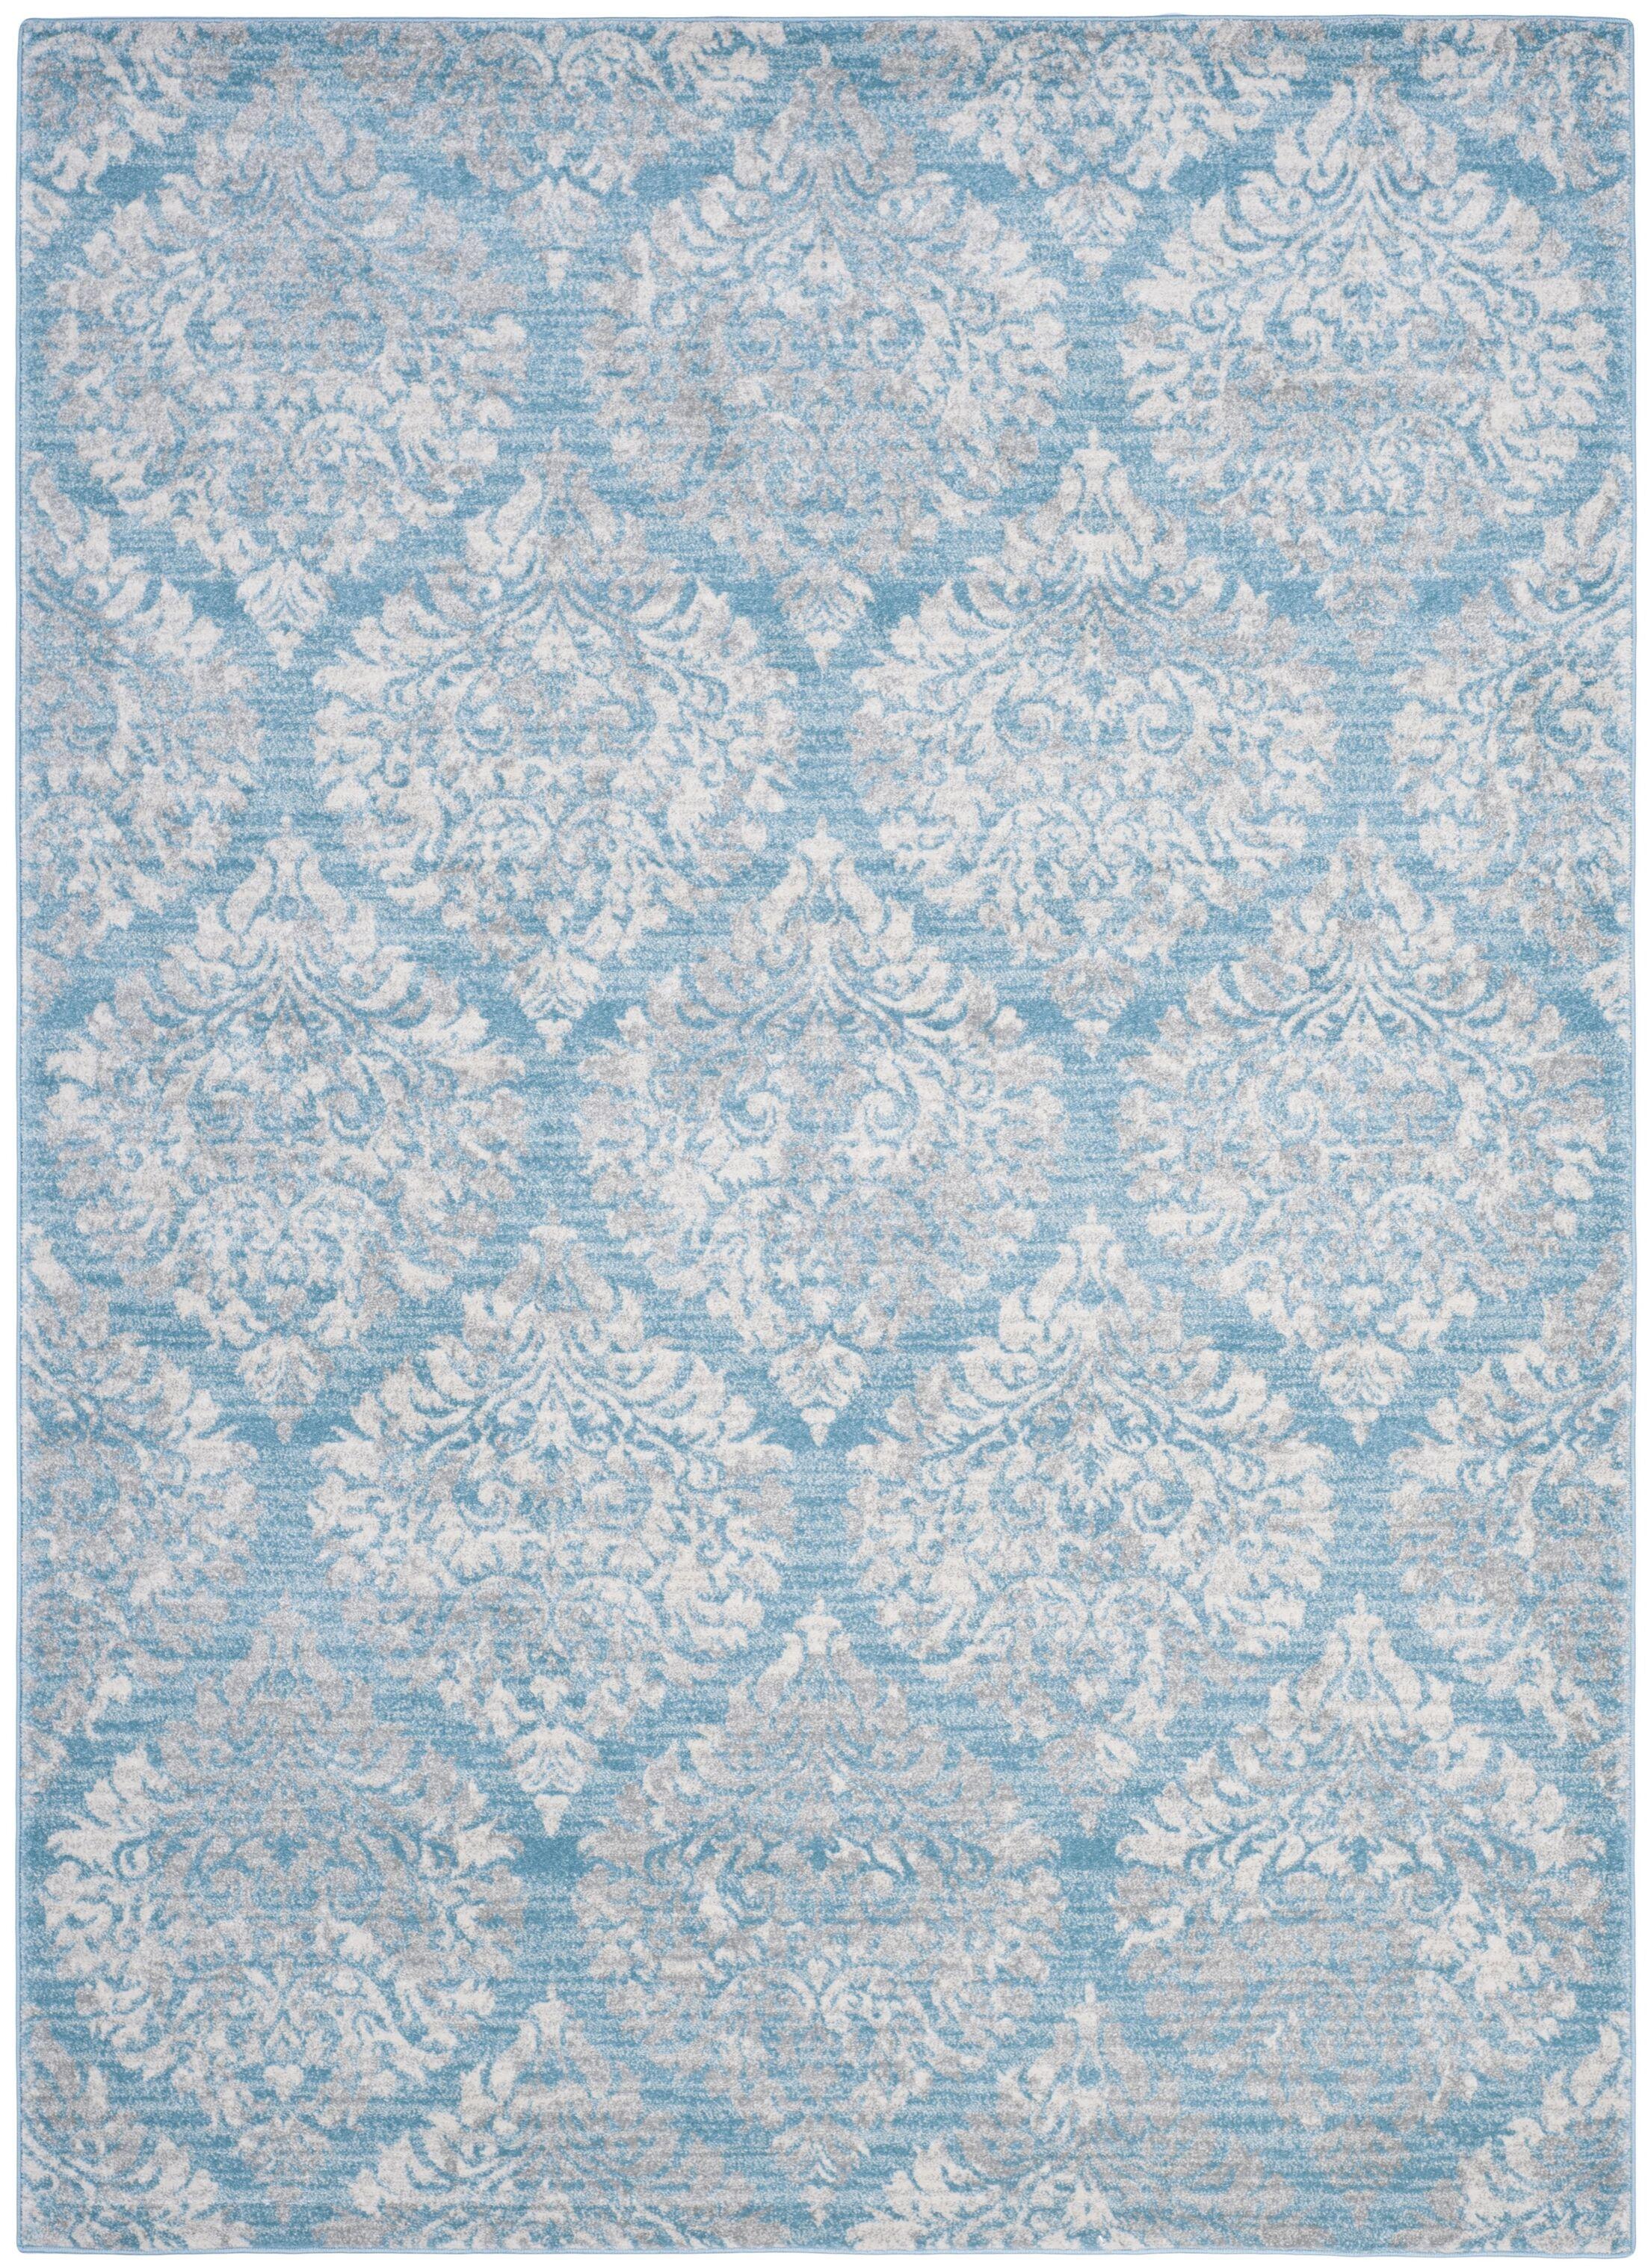 Augustus Light Blue/Ivory Area Rug Rug Size: Rectangle 4' x 6'